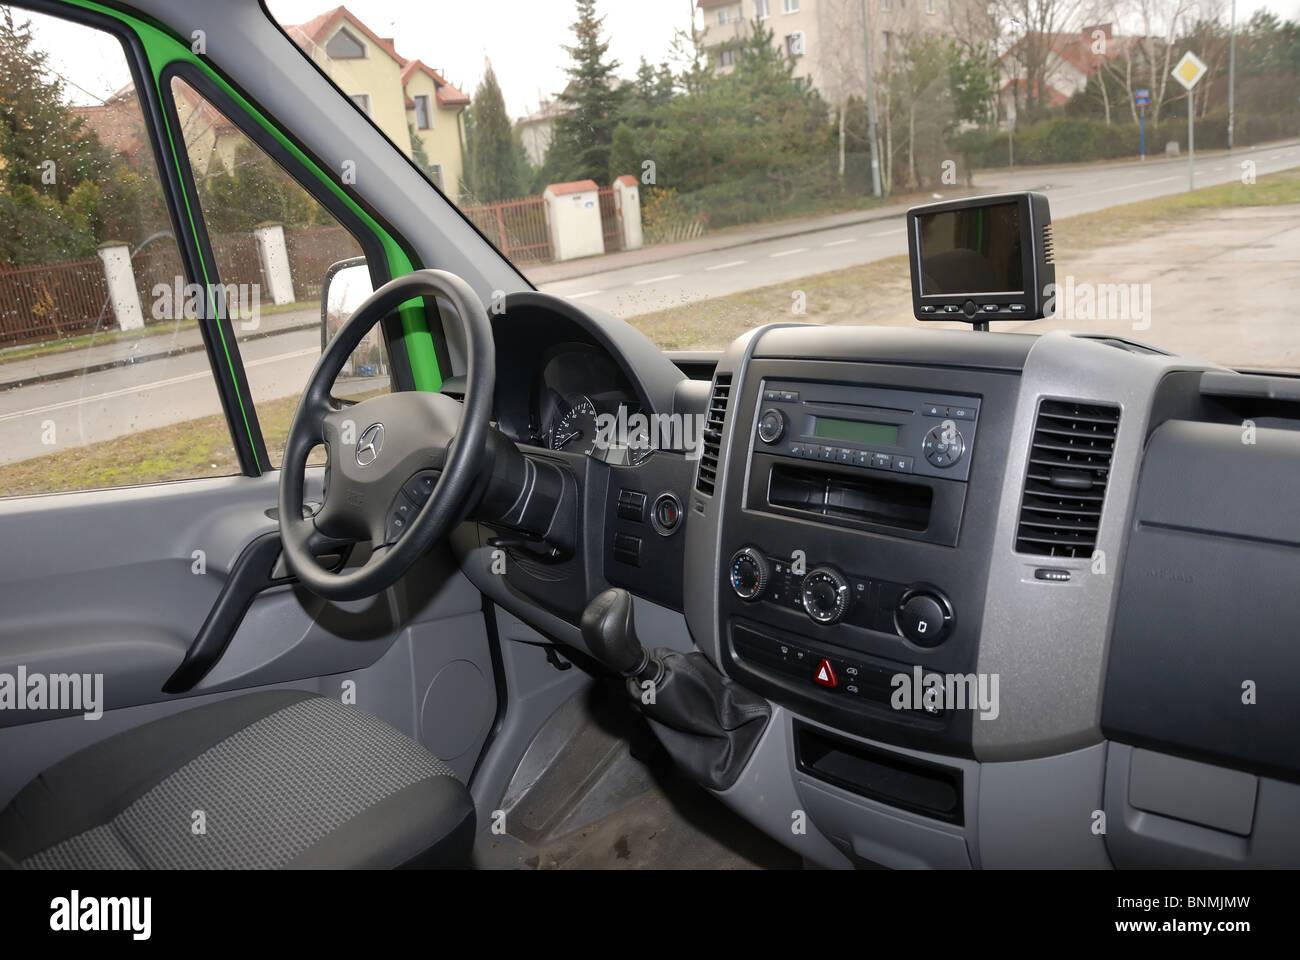 Mercedes benz sprinter 260 cdi van green l3h2 german mcv van cabin